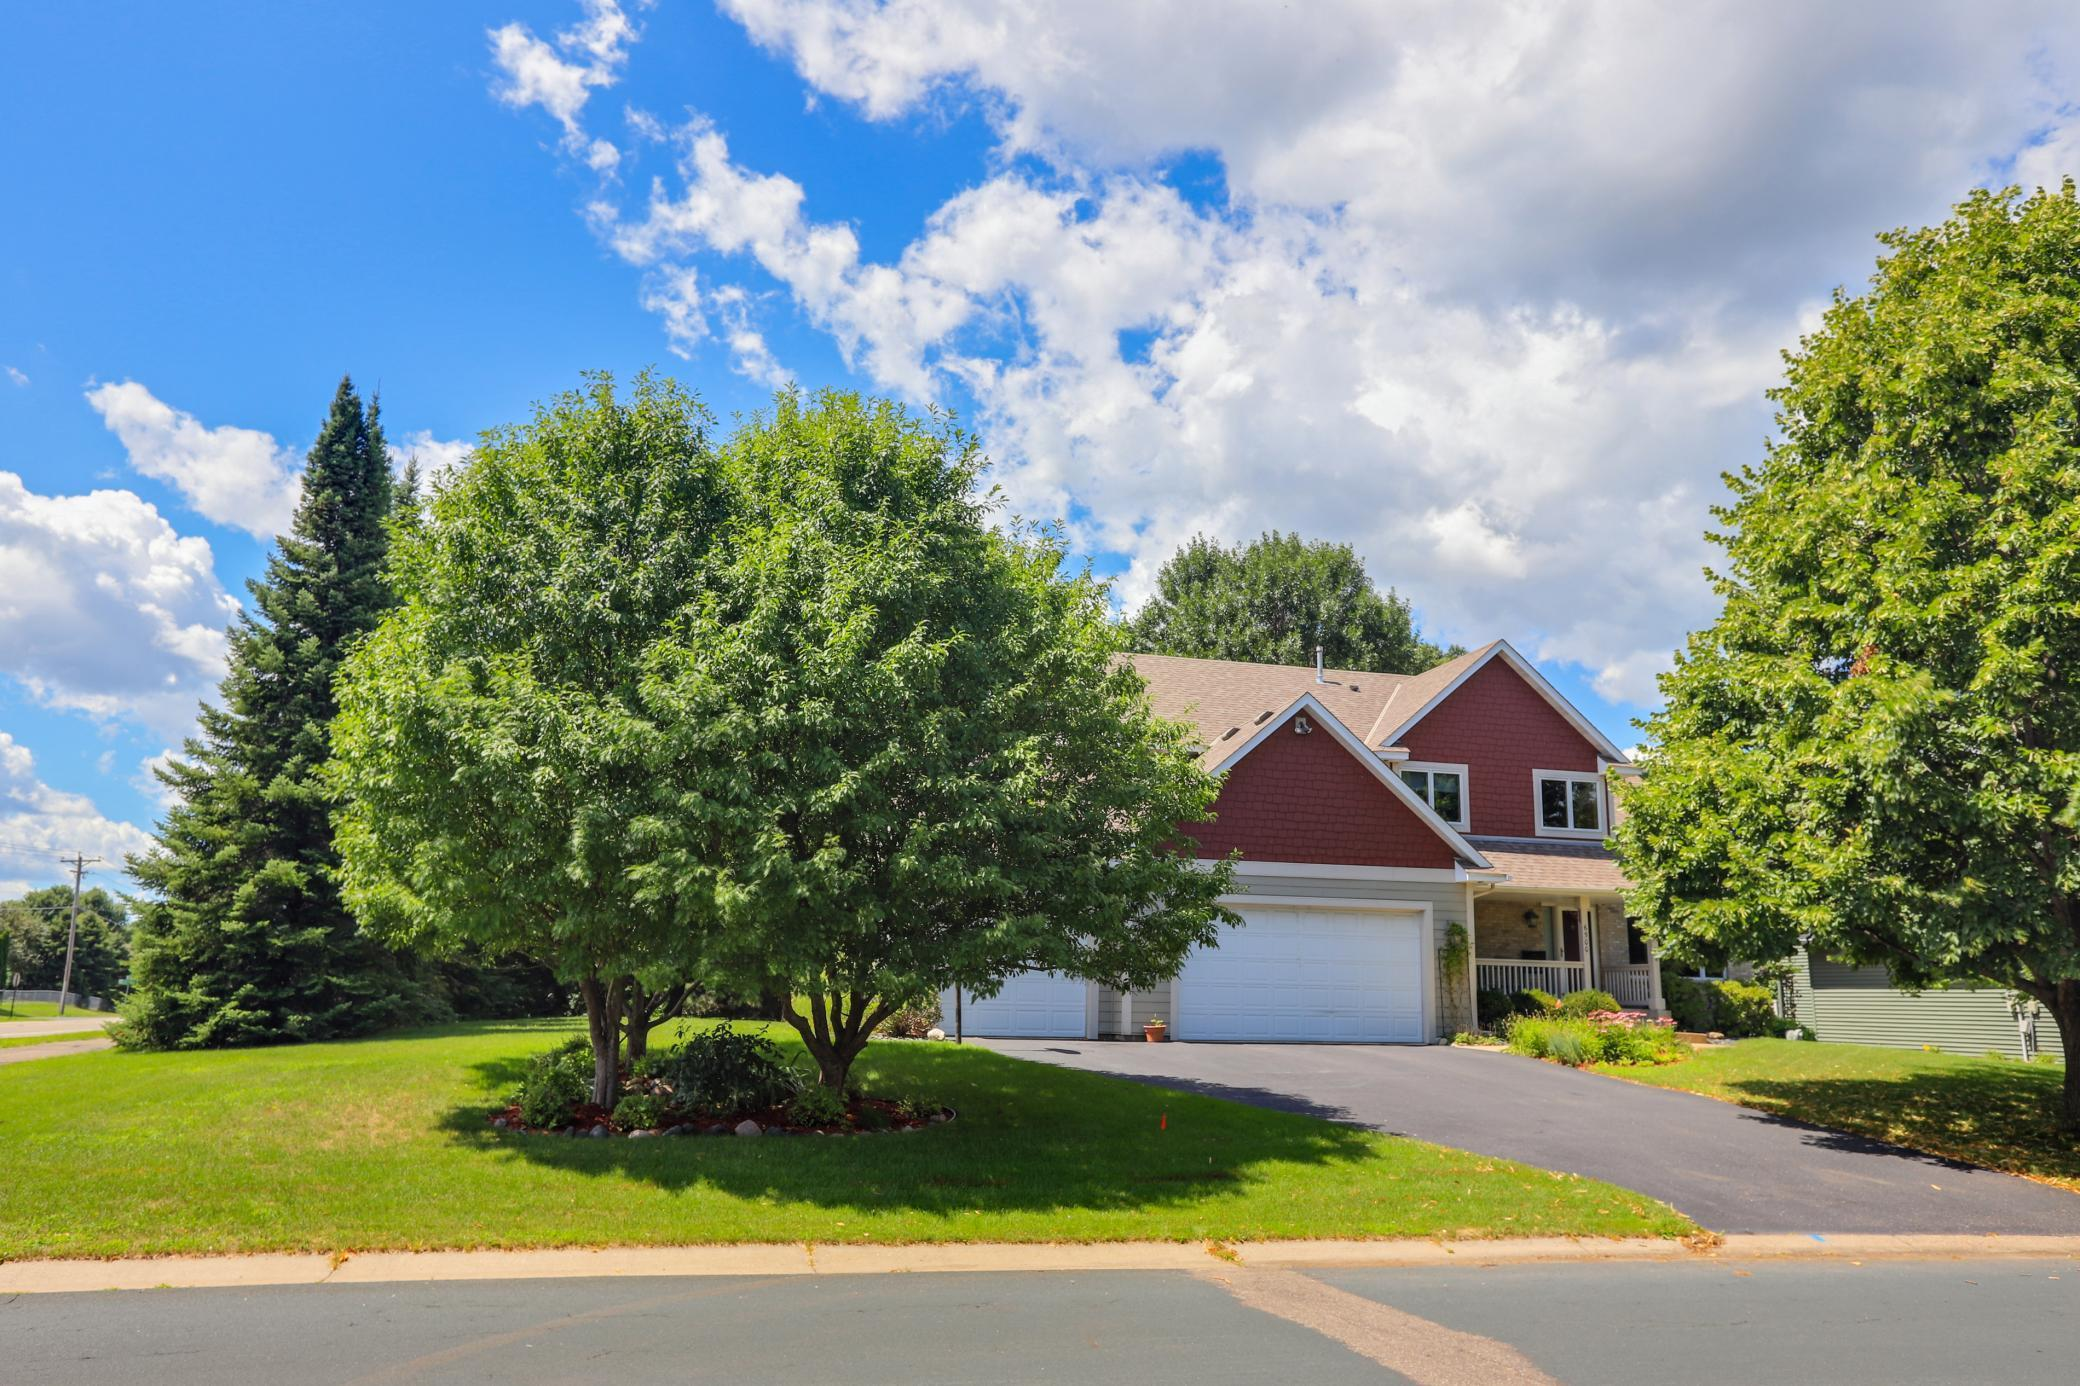 6500 Fawn Lane Property Photo - Lino Lakes, MN real estate listing